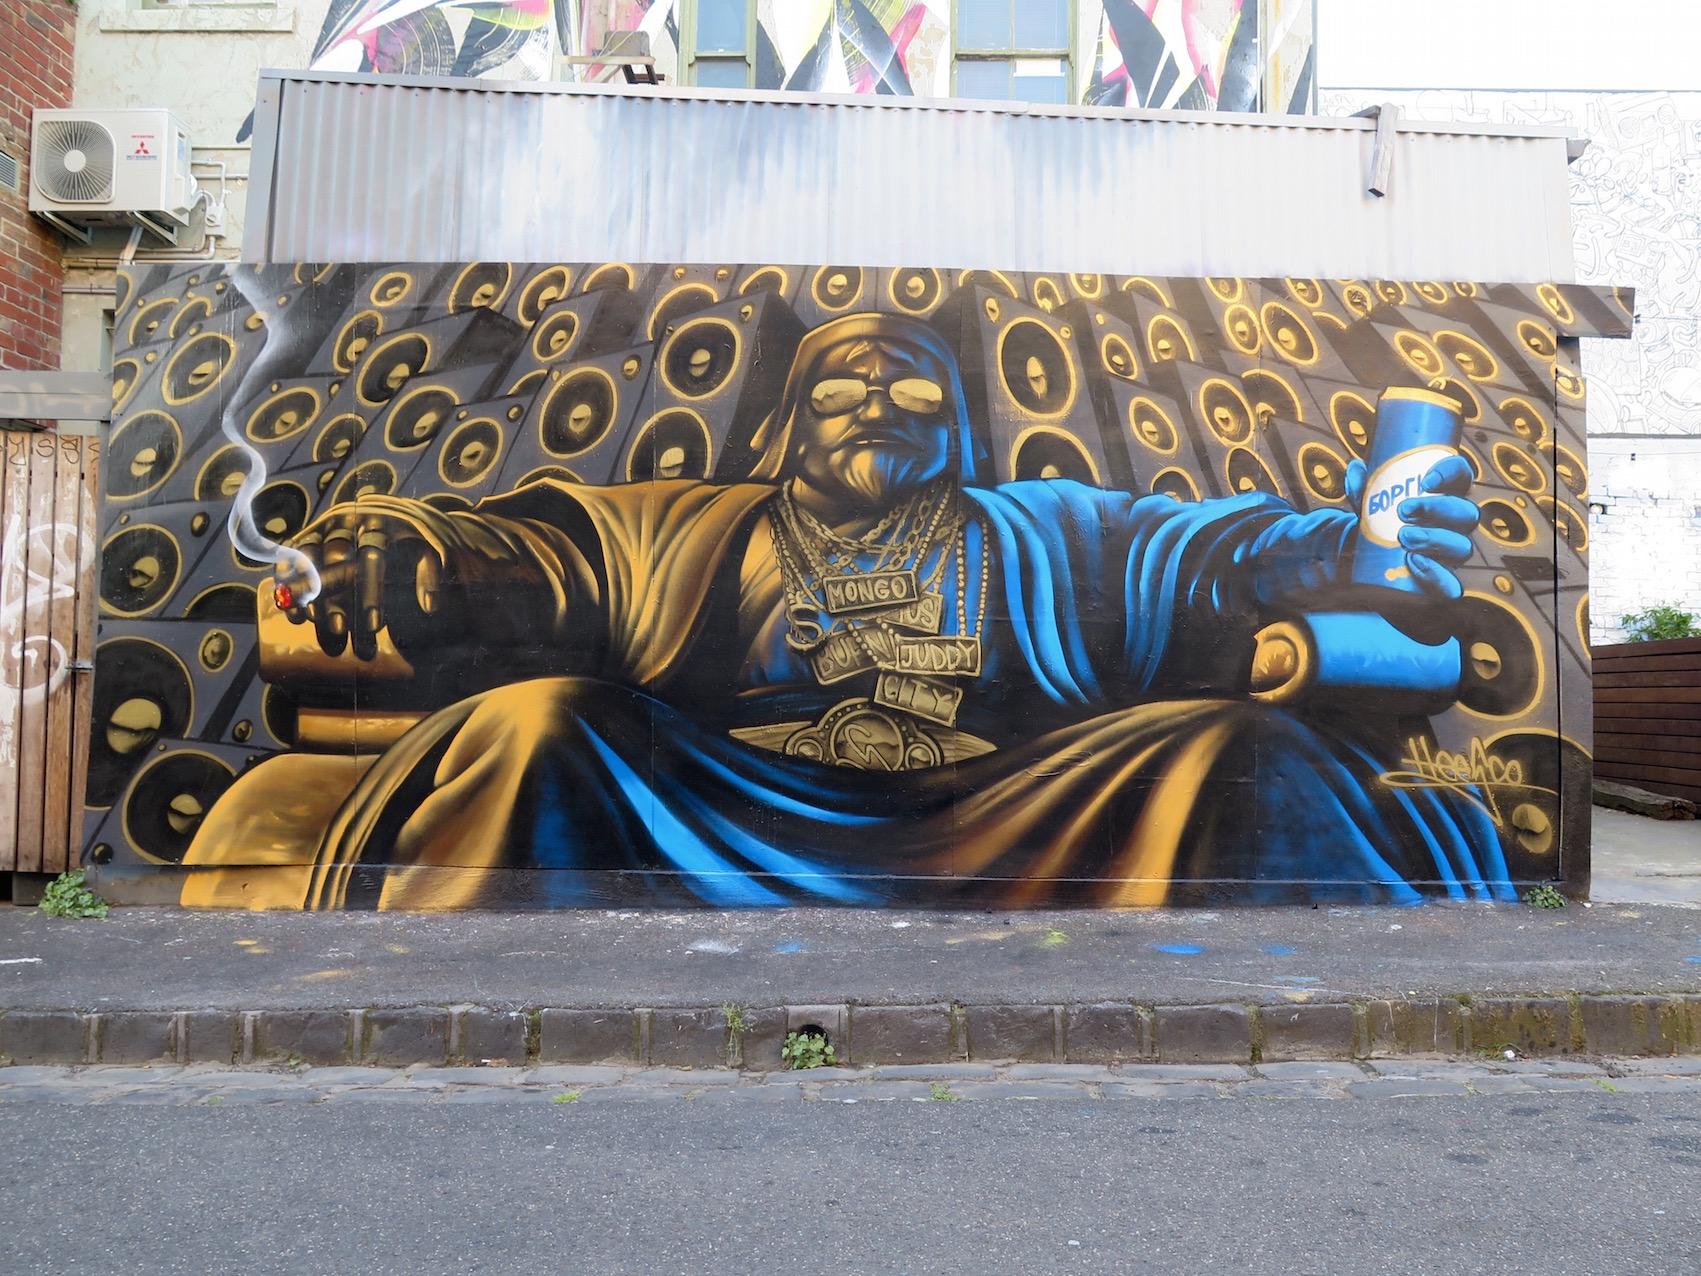 deansunshine_landofsunshine_melbourne_streetart_graffiti_invurt-top-ten-67-9-heesco-9